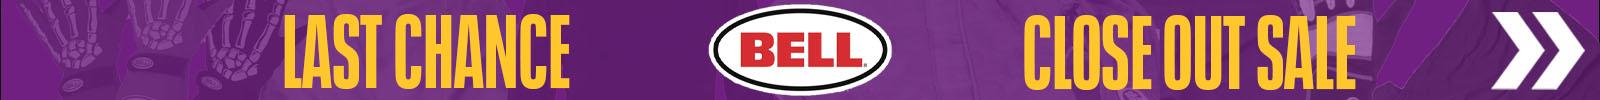 Bell Garage Sale Closeout